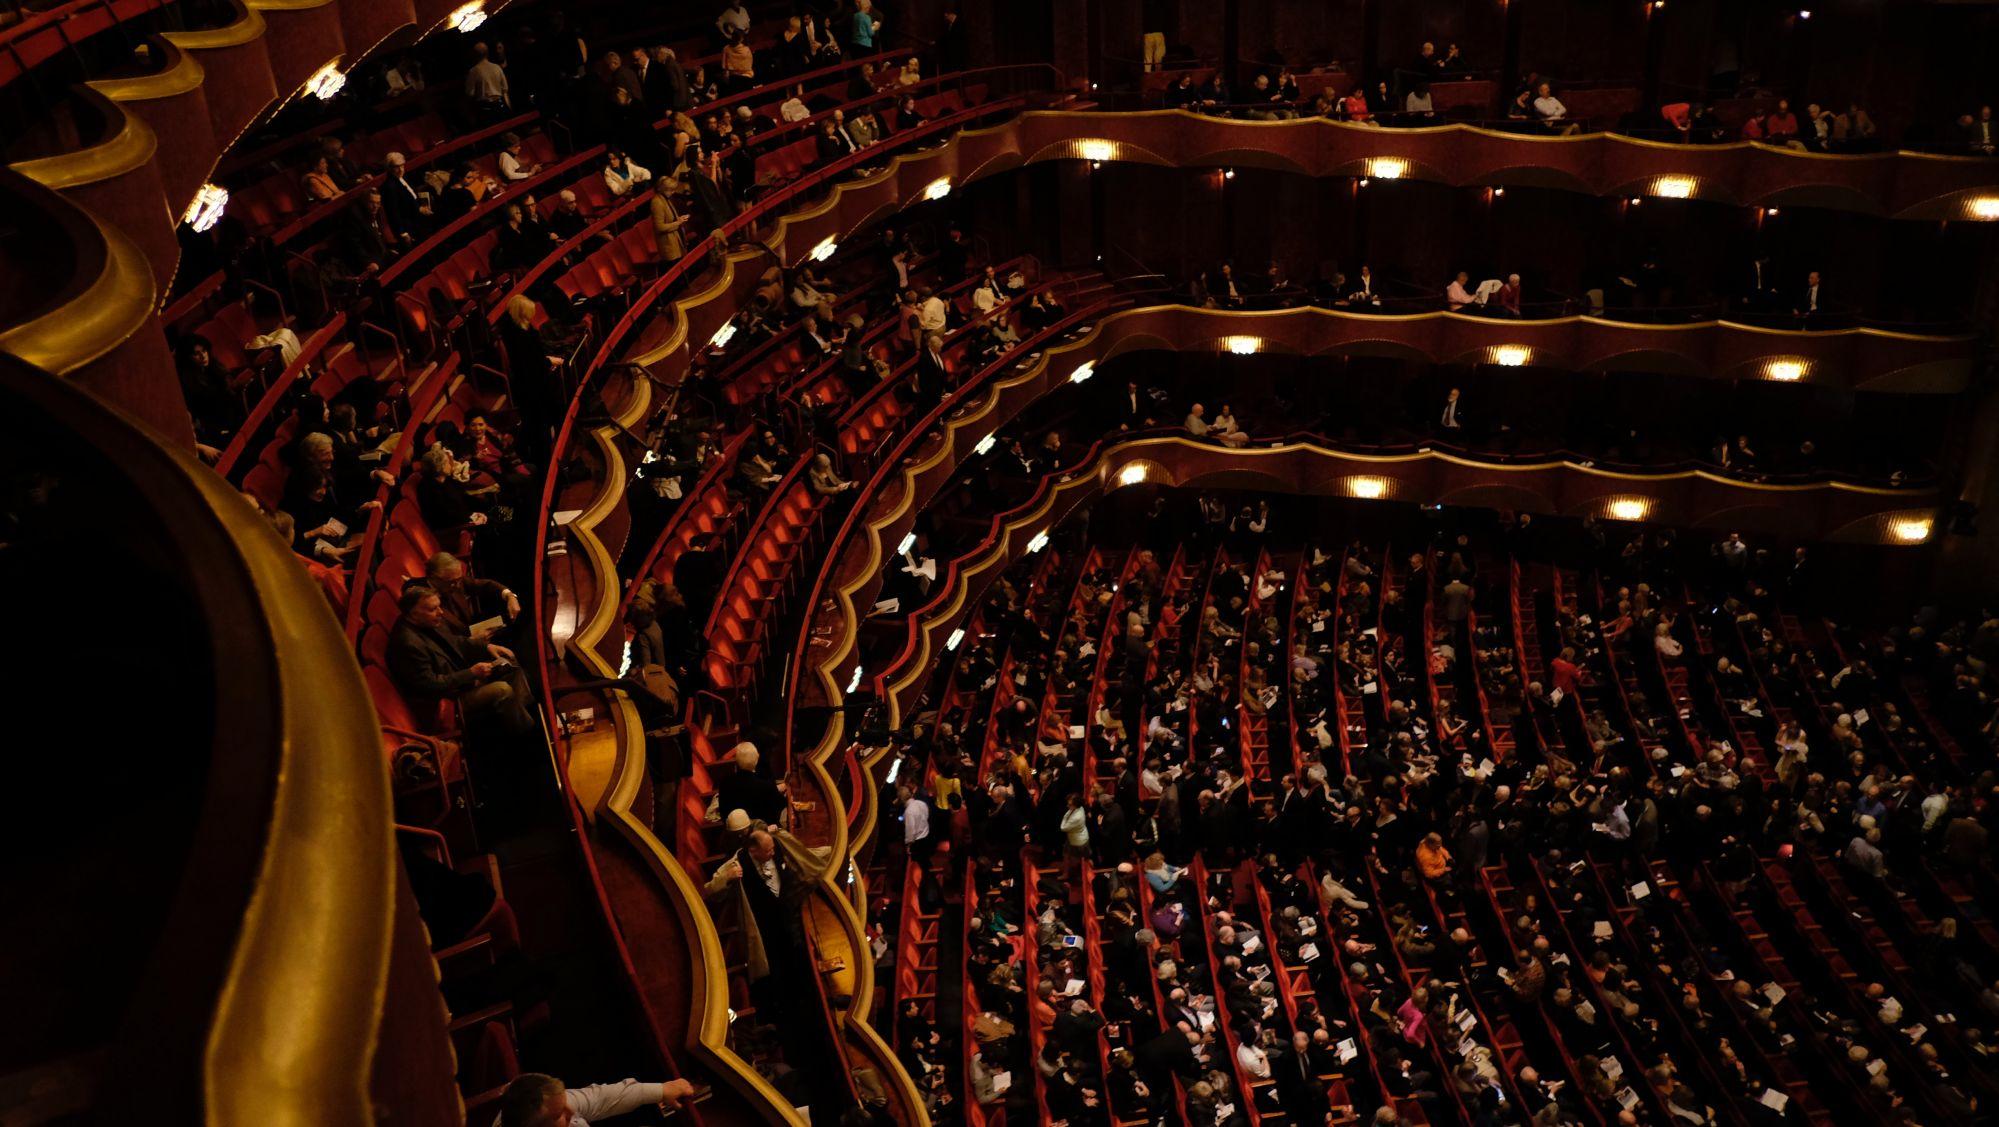 The Metropolitan Opera In New York Is Now Streaming Free Performances Online